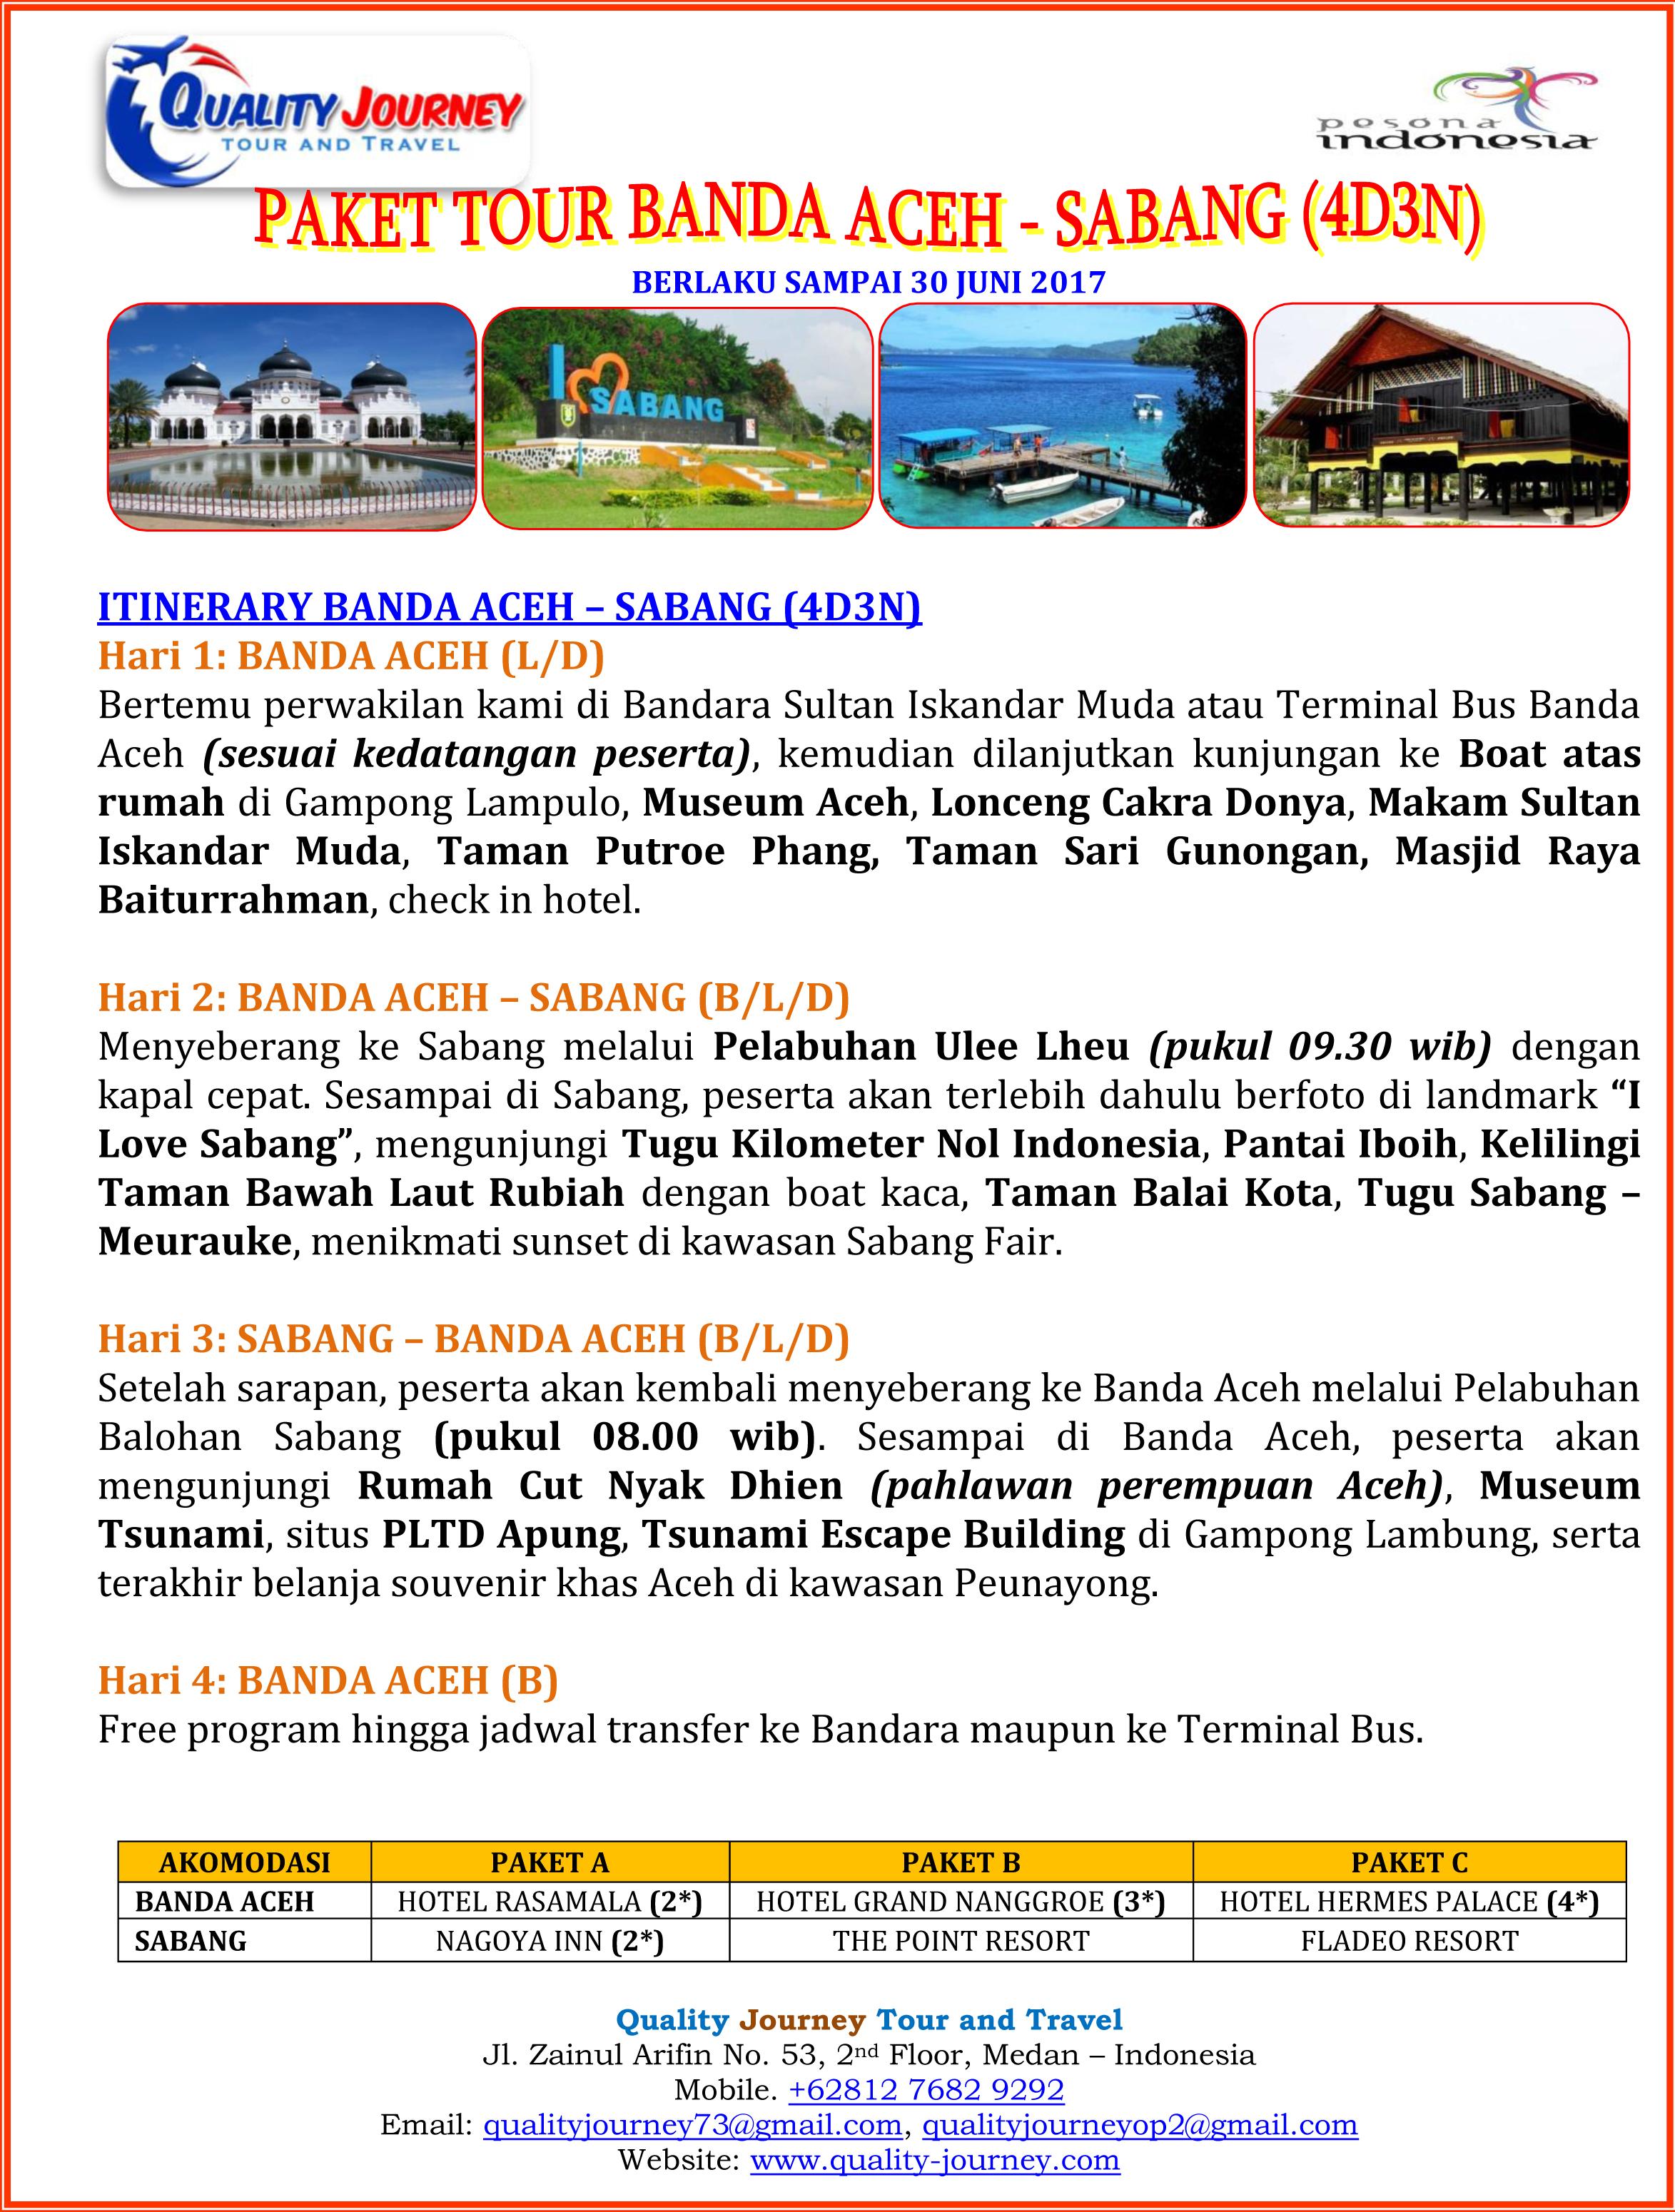 4d3n Tour Banda Aceh Sabang Quality Journey Paket 2017 1